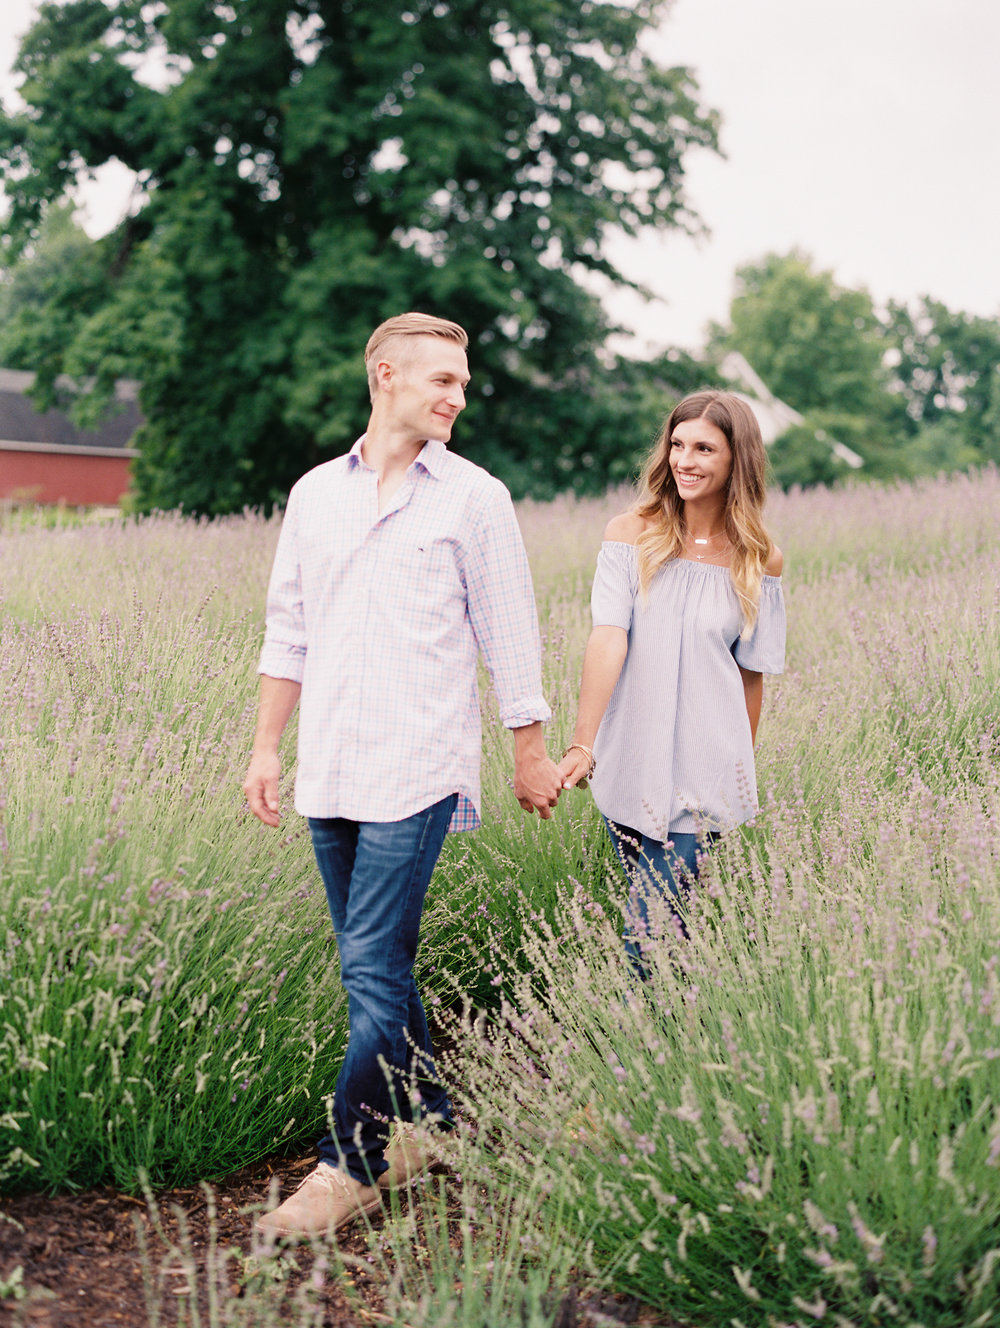 Kerri+Austin+Lavender+Field+Engagement-86.jpg